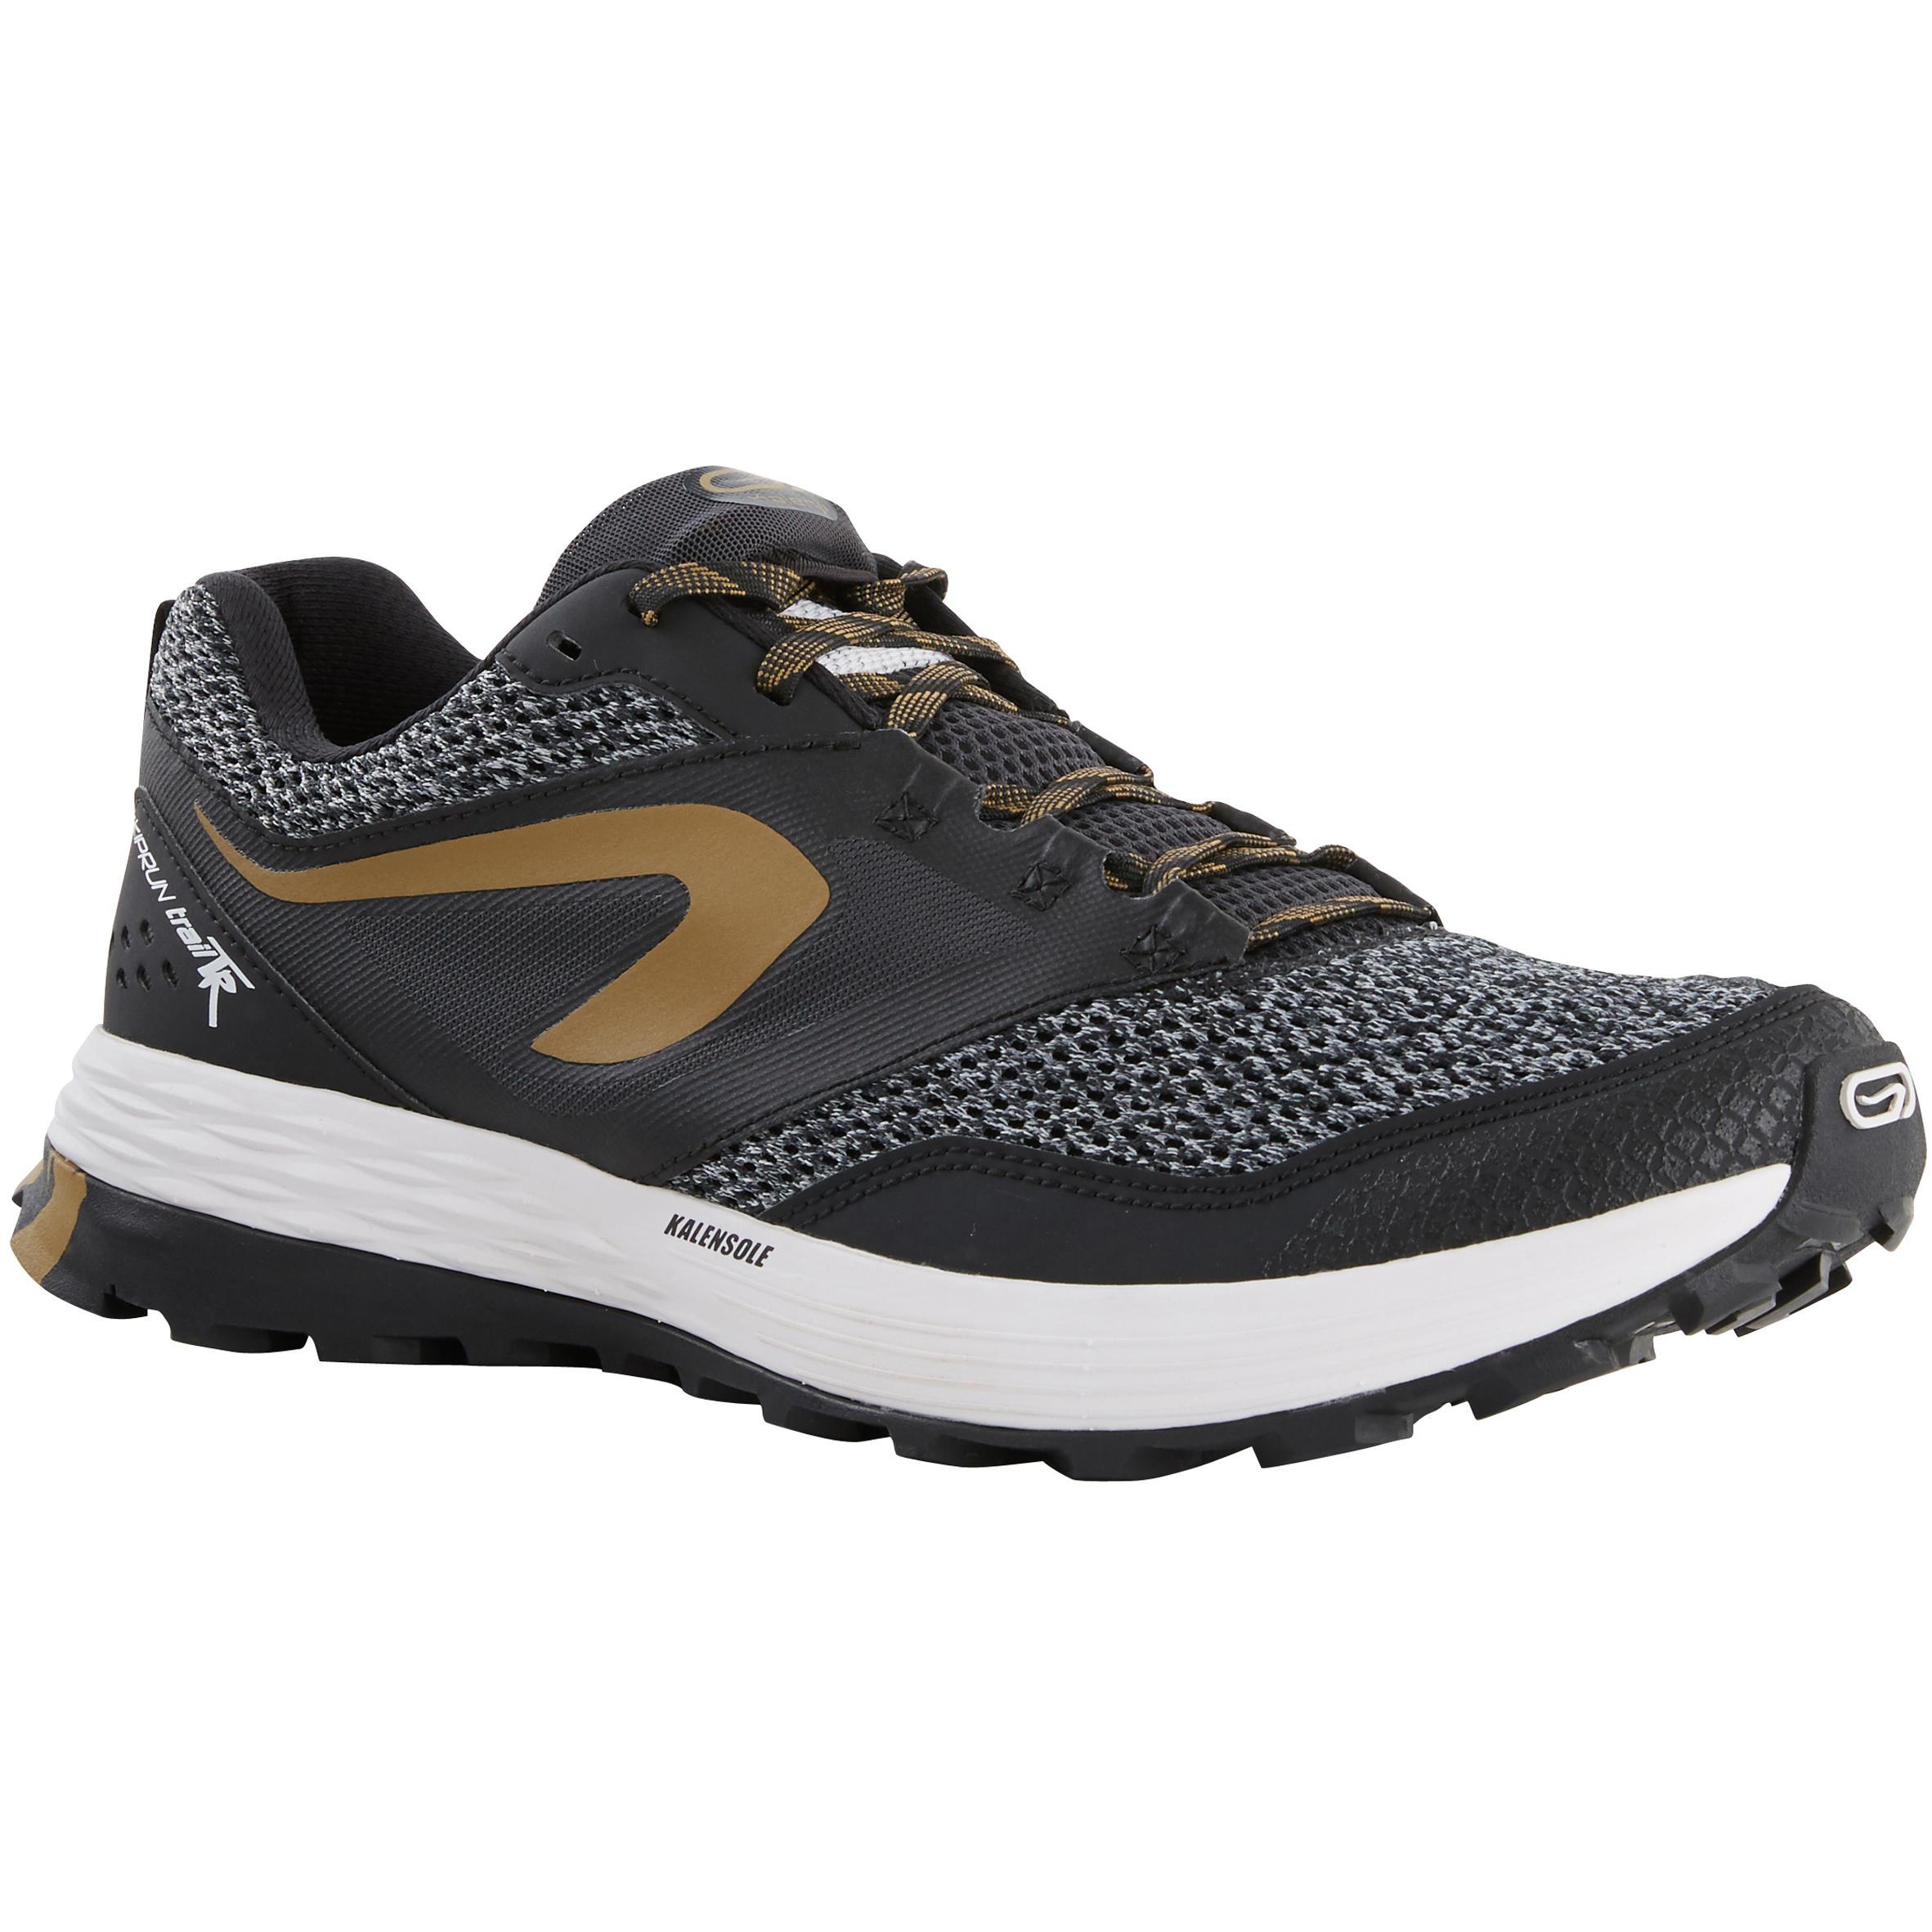 new arrival f02c0 c76f4 Comprar zapatillas de trail running   Decathlon